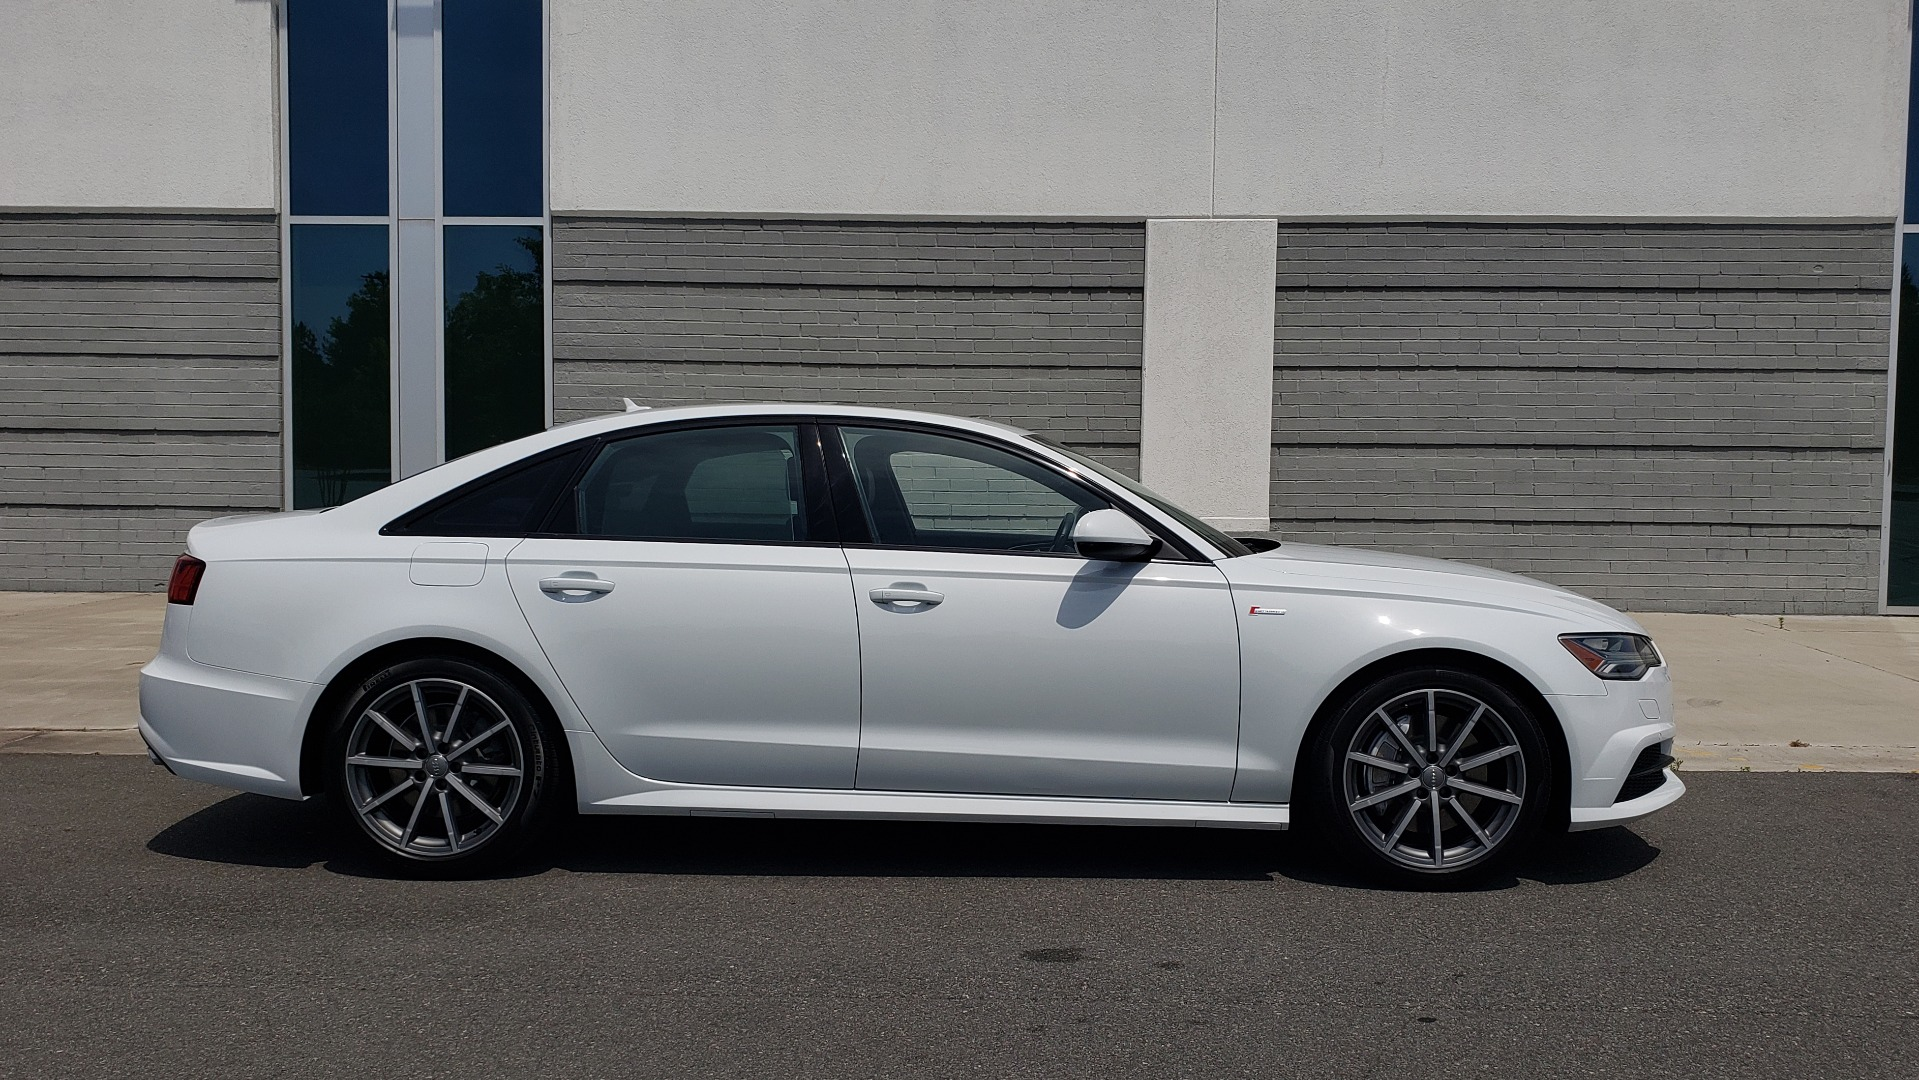 Used 2017 Audi A6 PRESTIGE SEDAN 3.0T / NAV / SUNROOF / BLACK OPTIC / CLD WTHR / REARVIEW for sale $30,797 at Formula Imports in Charlotte NC 28227 10